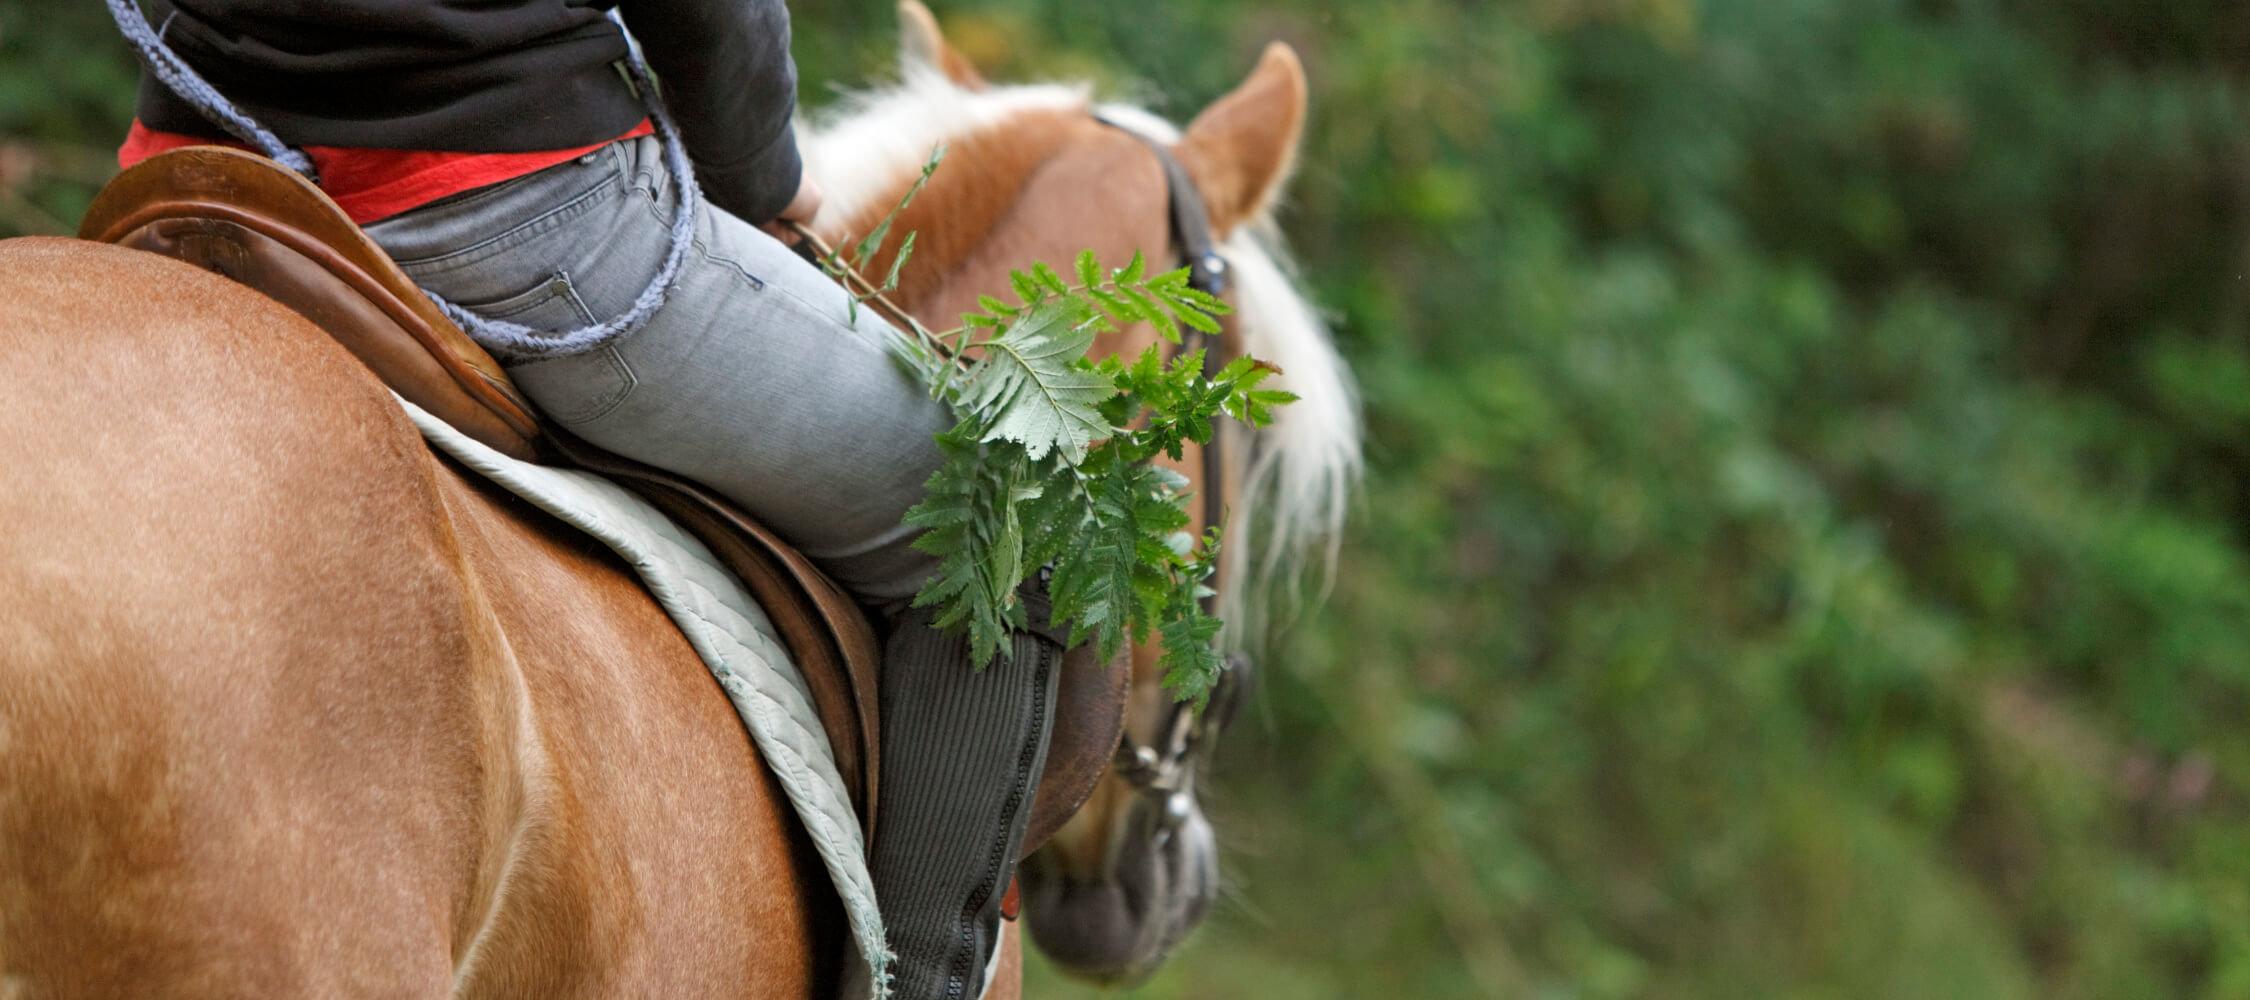 Italien-Trentino_Suedtirol_Alto_Adige_Merano_Meran_Natur_Sport_Reiten_Pferd_MGM-Frieder-Blickle_mgm00484frbl_2250x1000